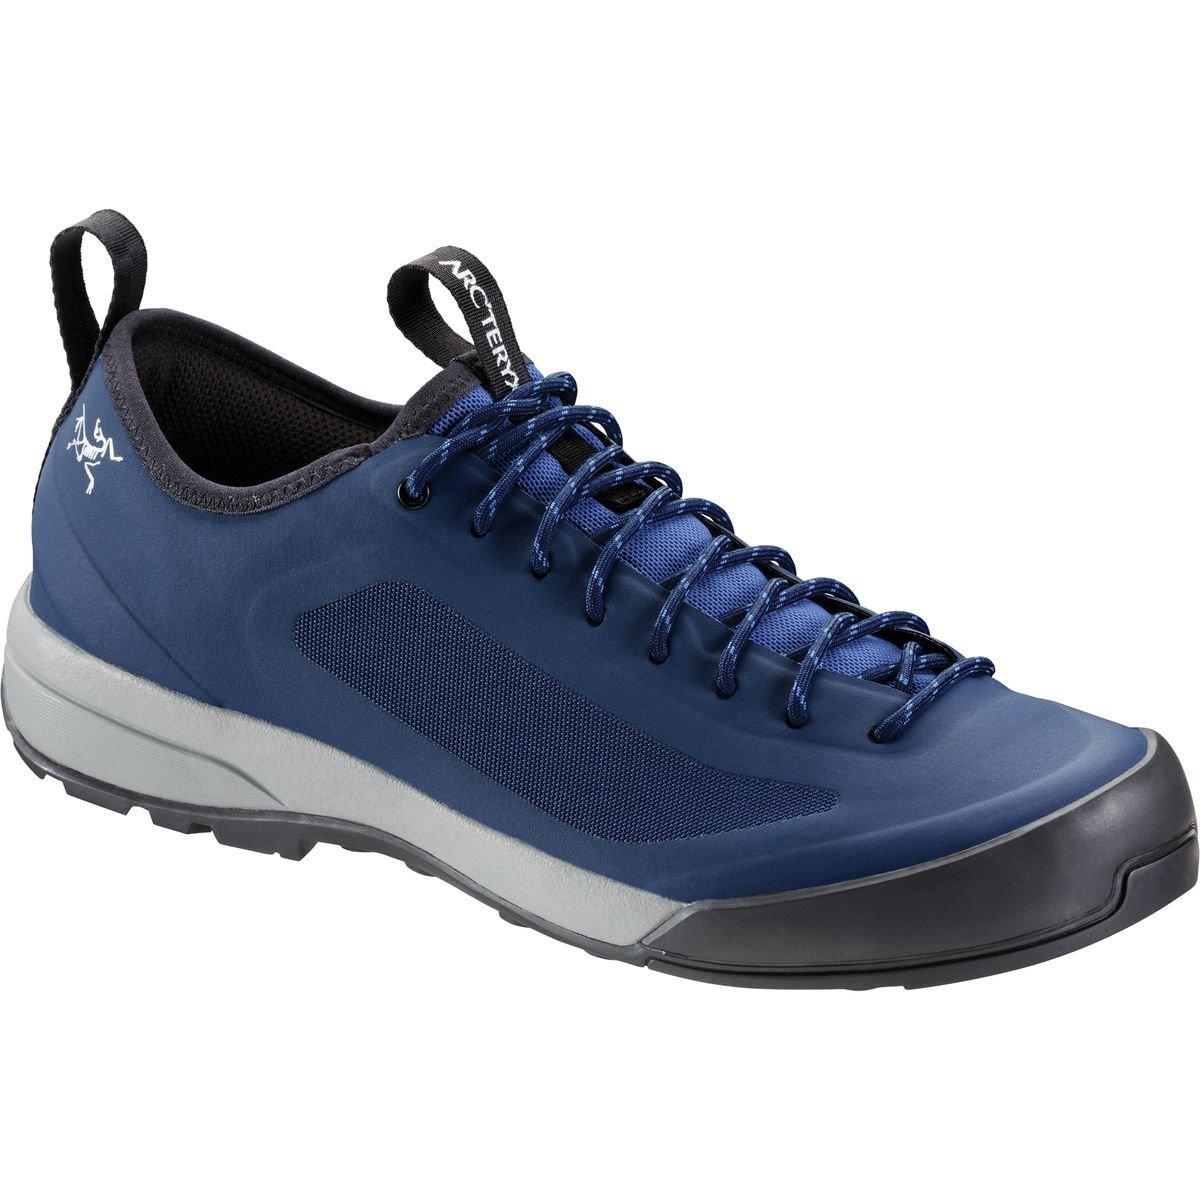 Arc'teryx Acrux SL Approach Shoes - Women's B01GFEVNF0 10 B(M) US Abyssal Blue/Gentiane